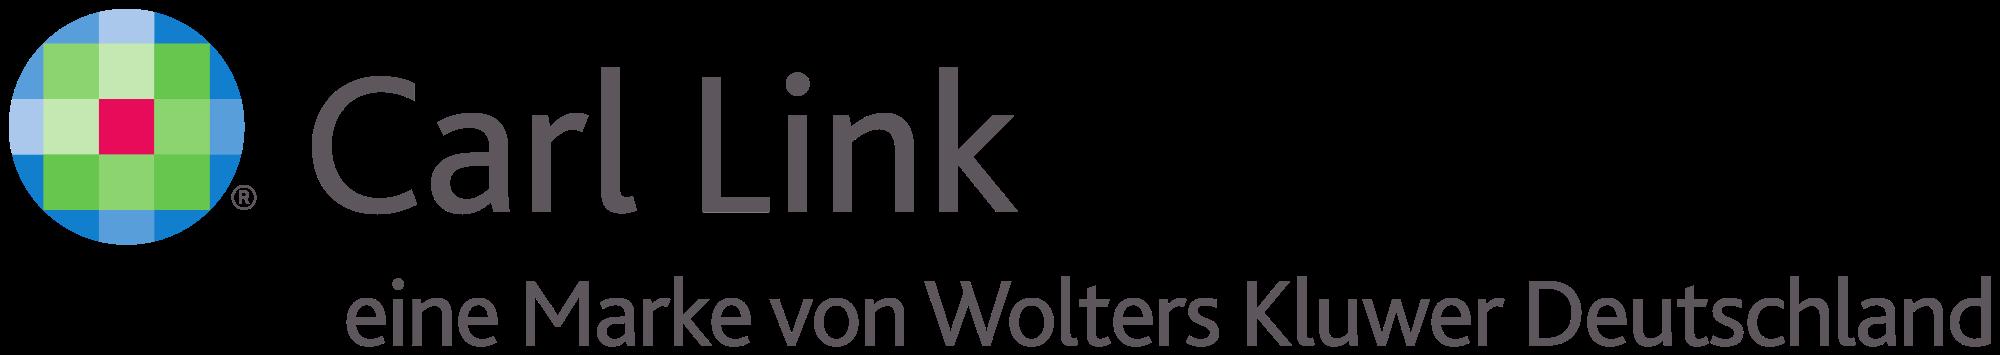 Carl Link Verlag